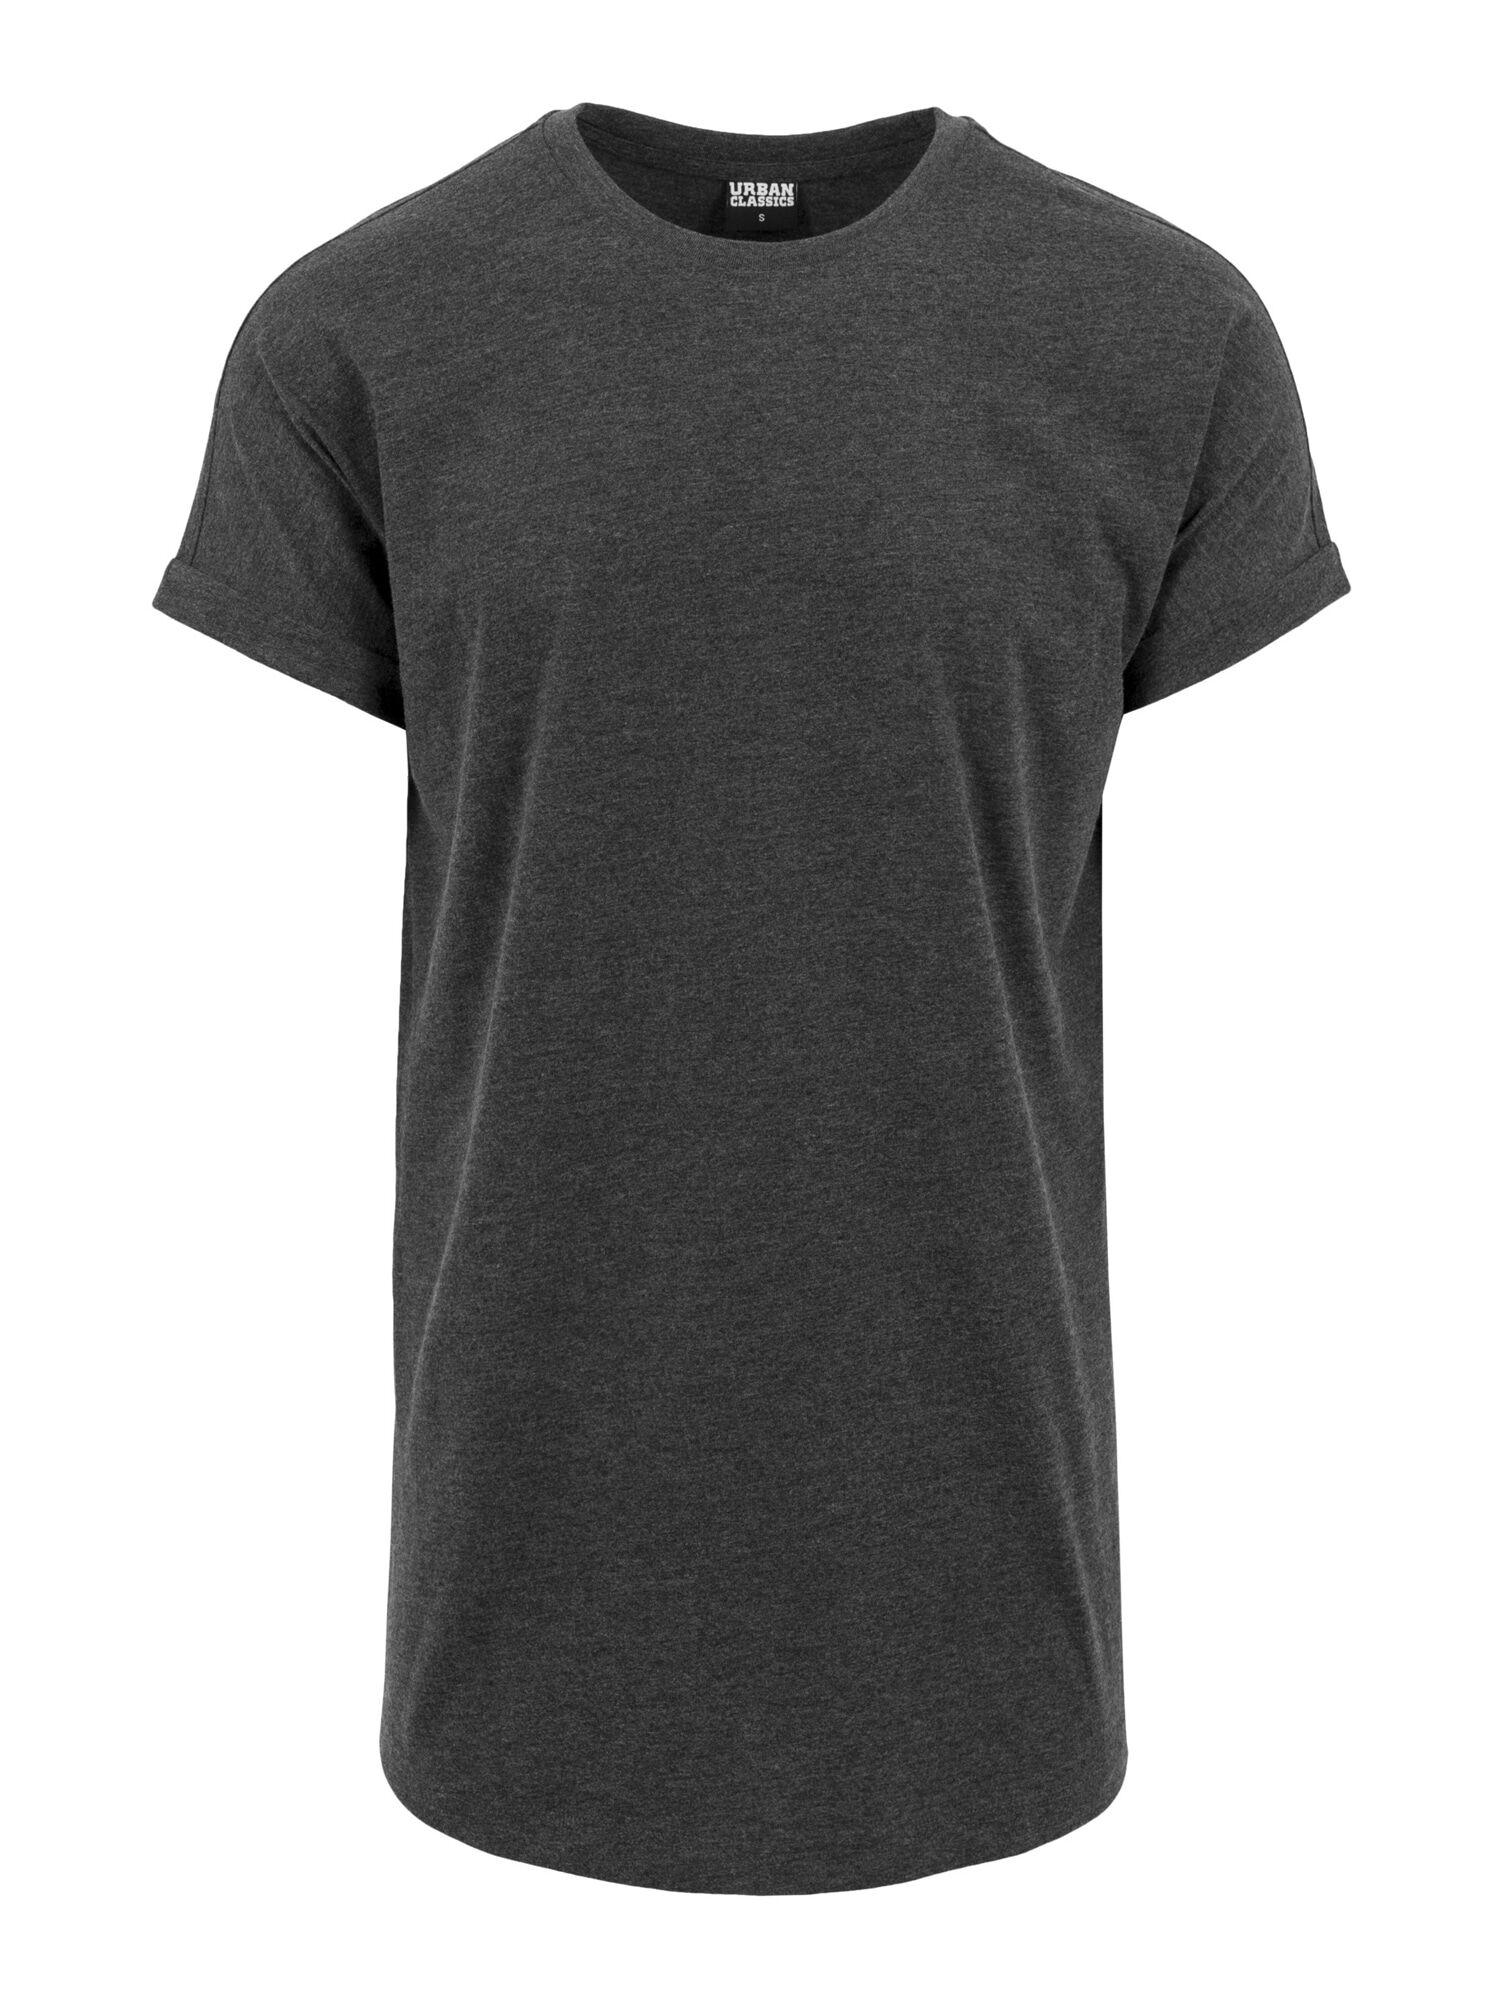 Urban Classics T-Shirt  - Gris - Taille: XL - male